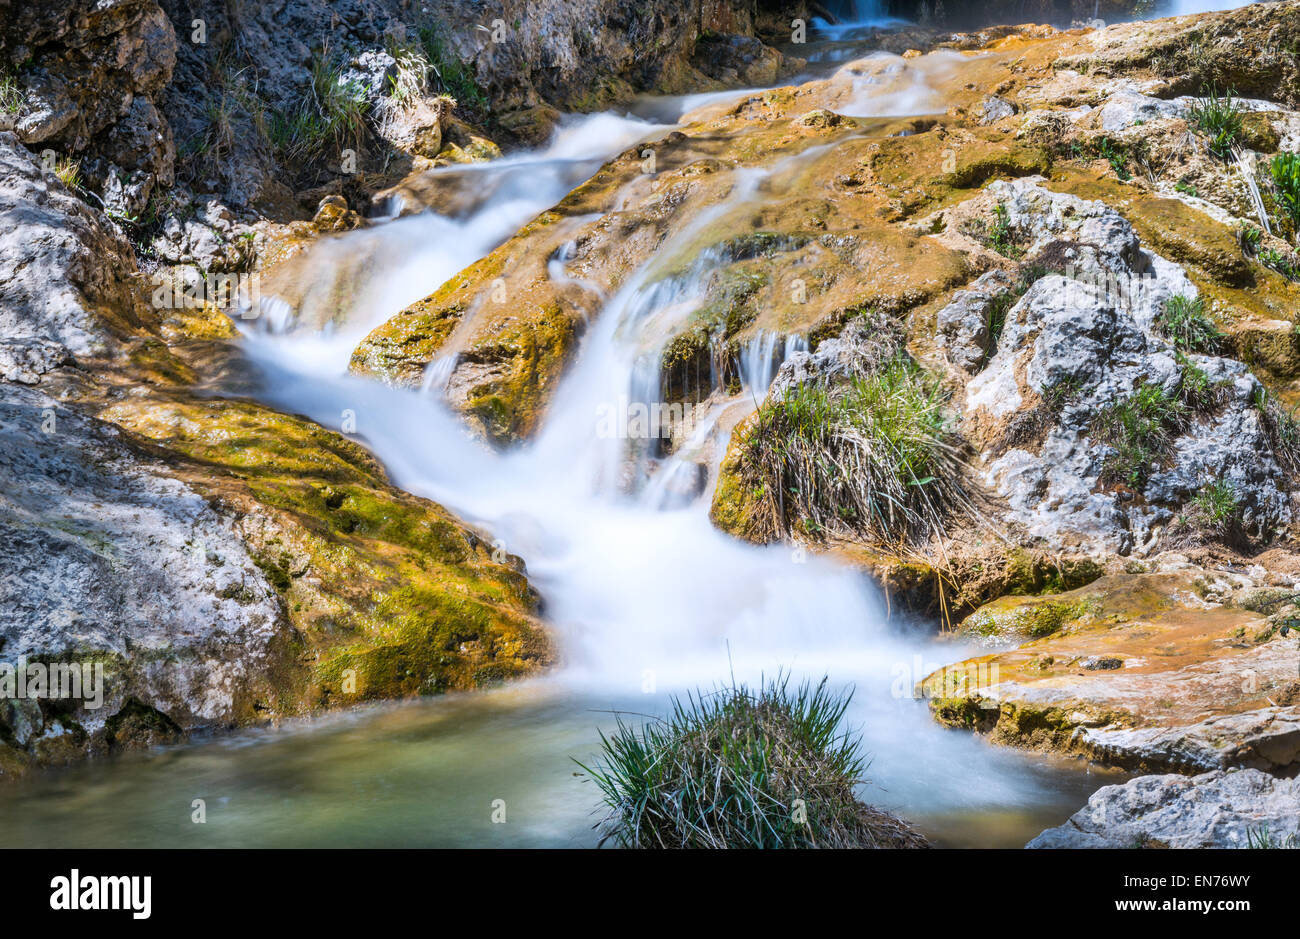 Waterfall on the River Guazalamanco, Cazorla Region, Jaen Province, Andalusia, Spain - Stock Image